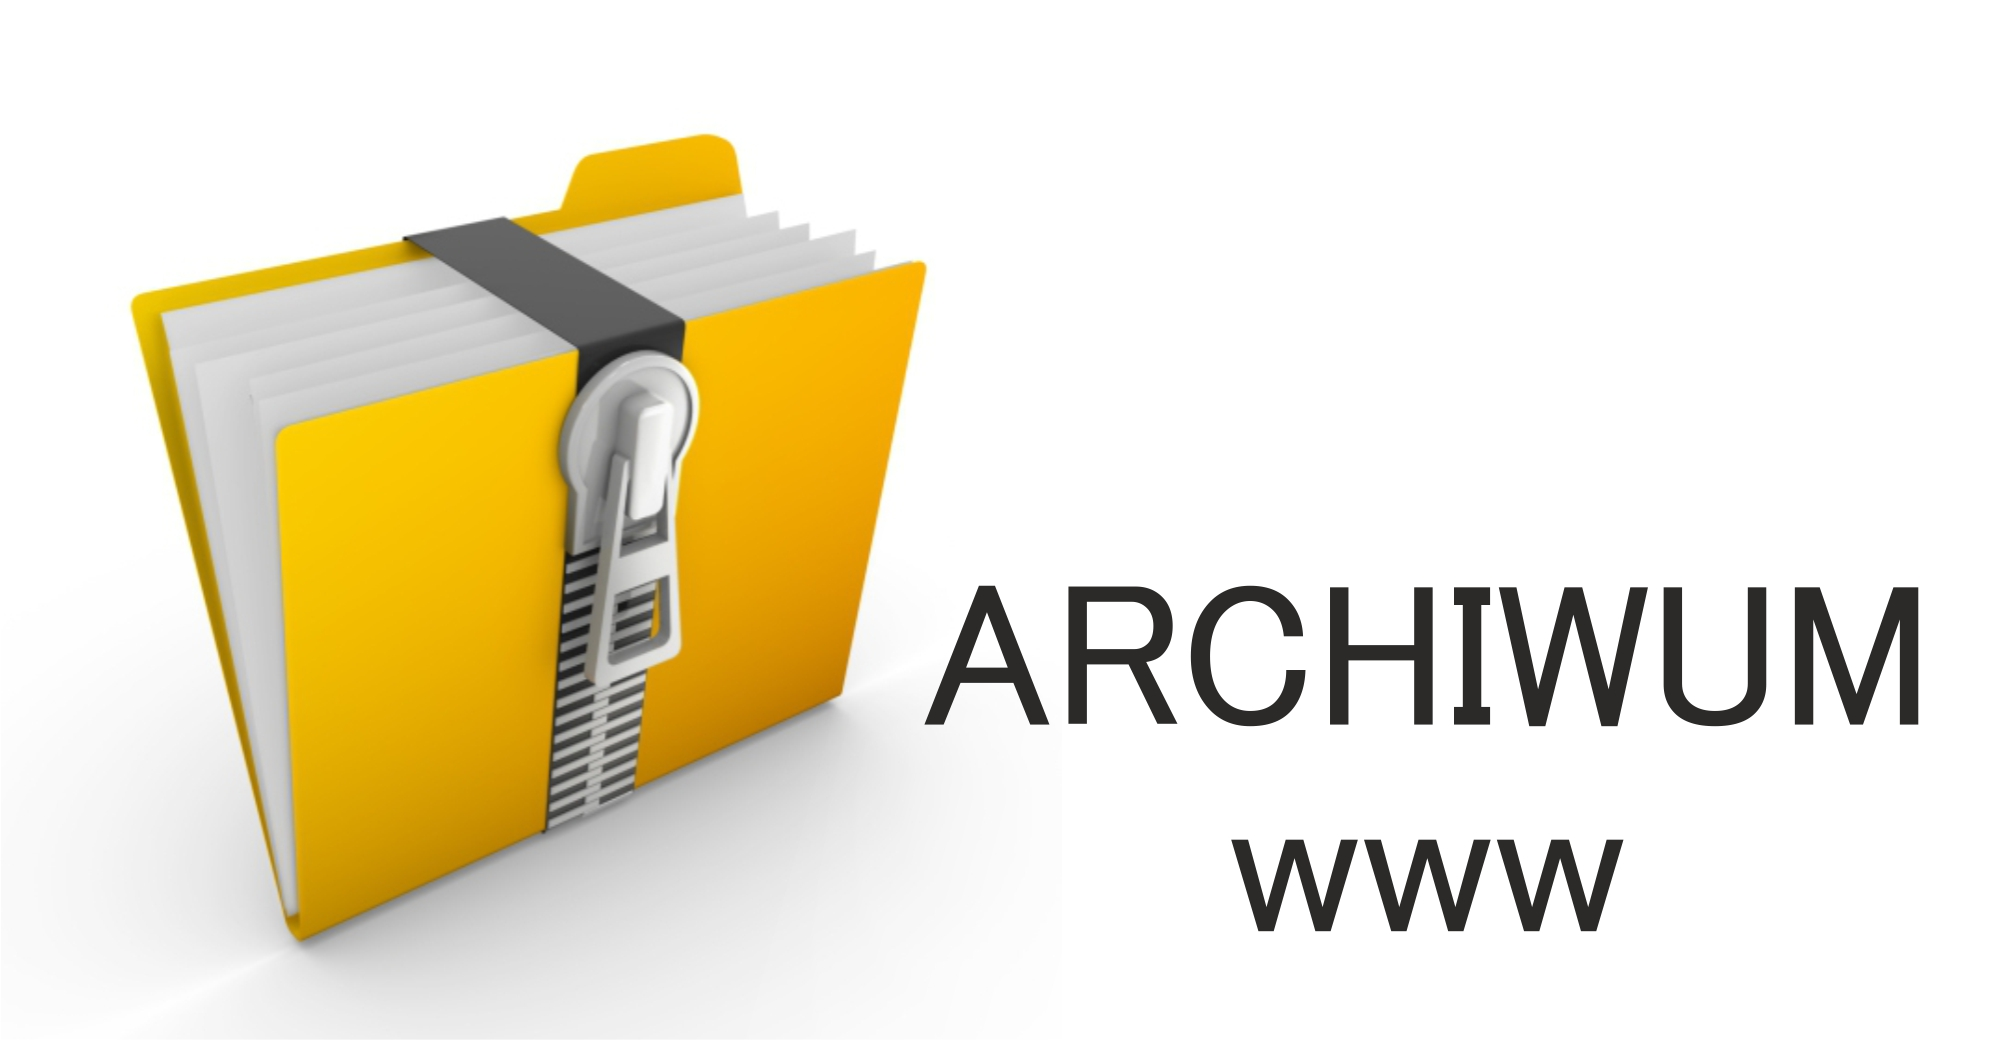 Baner: Archiwum WWW